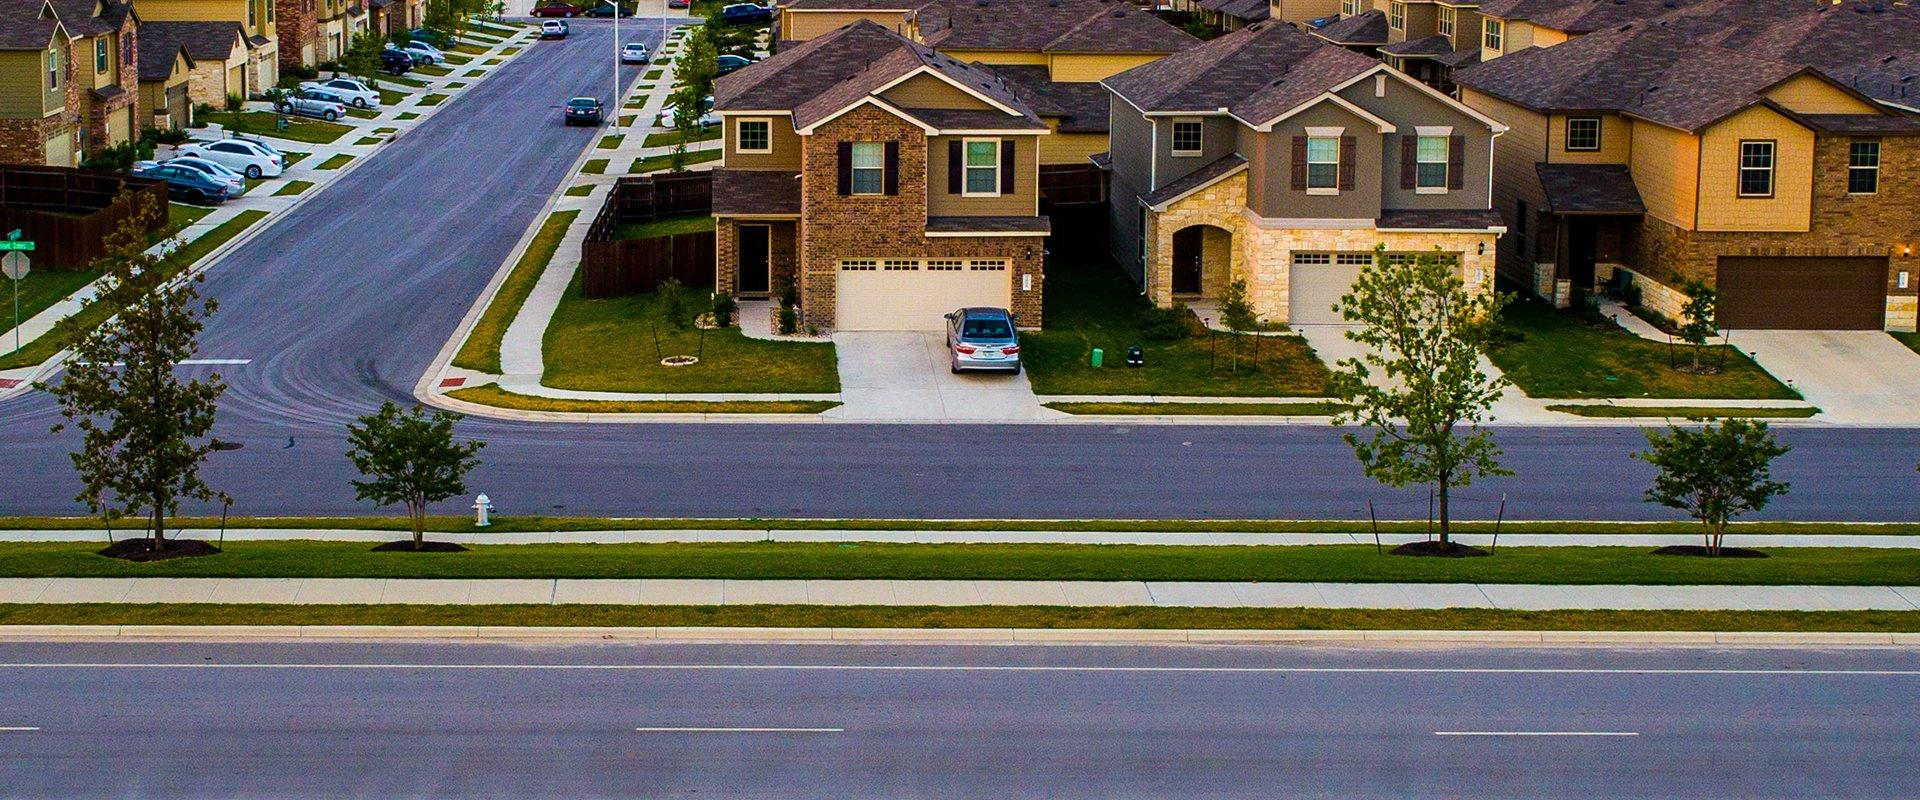 a residential neighborhood